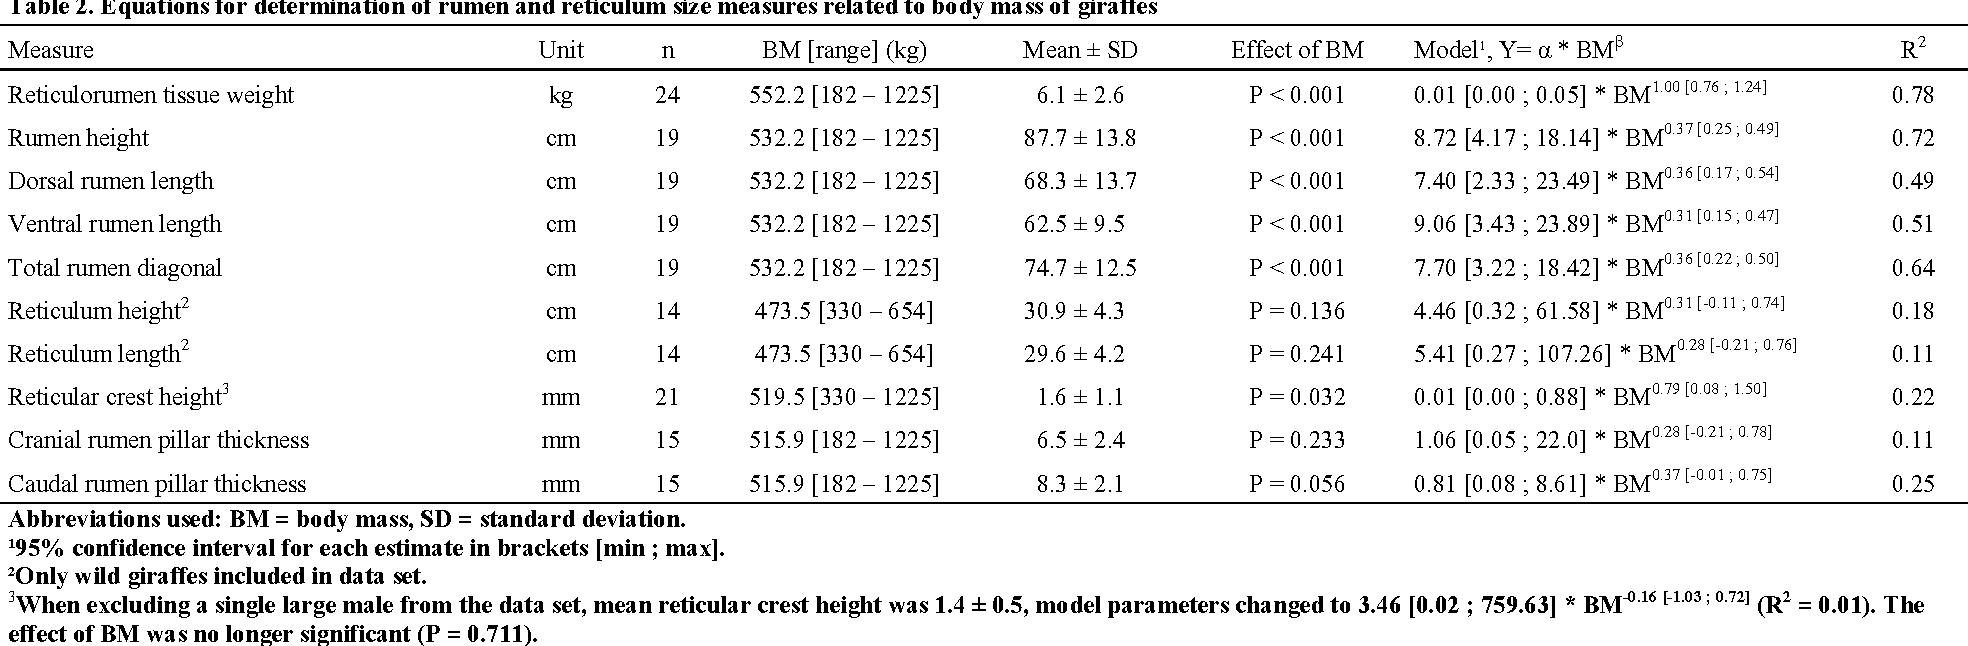 Table 2 from Quantitative Macroscopic Anatomy of the Giraffe ...